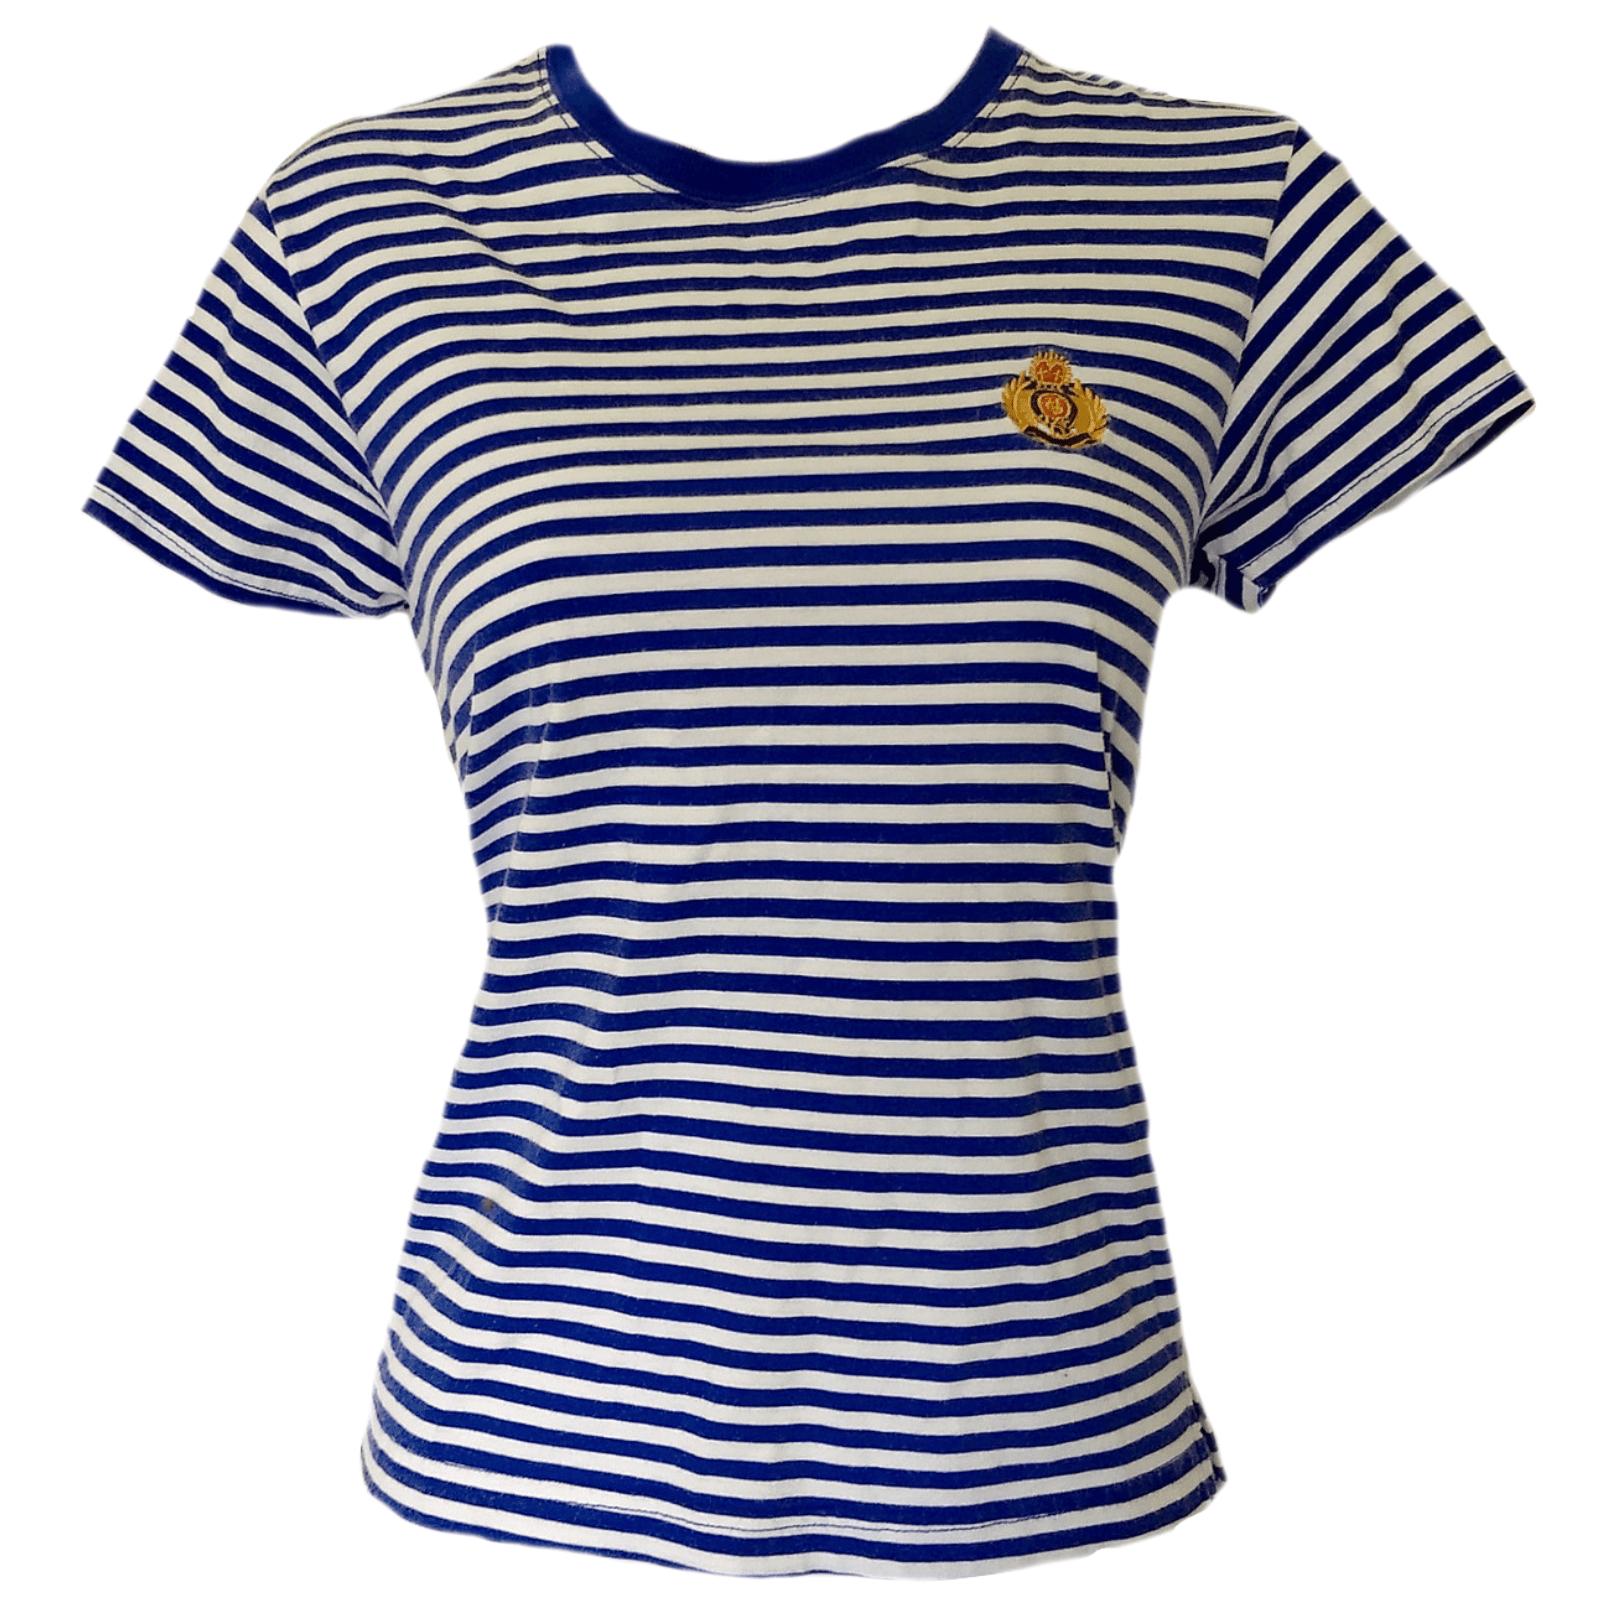 f27beb5668 £29.99 - Vintage Striped Top Emblem 90s Tshirt Tee Shirt Blue Stripes Size  Small – The Pixie Dust